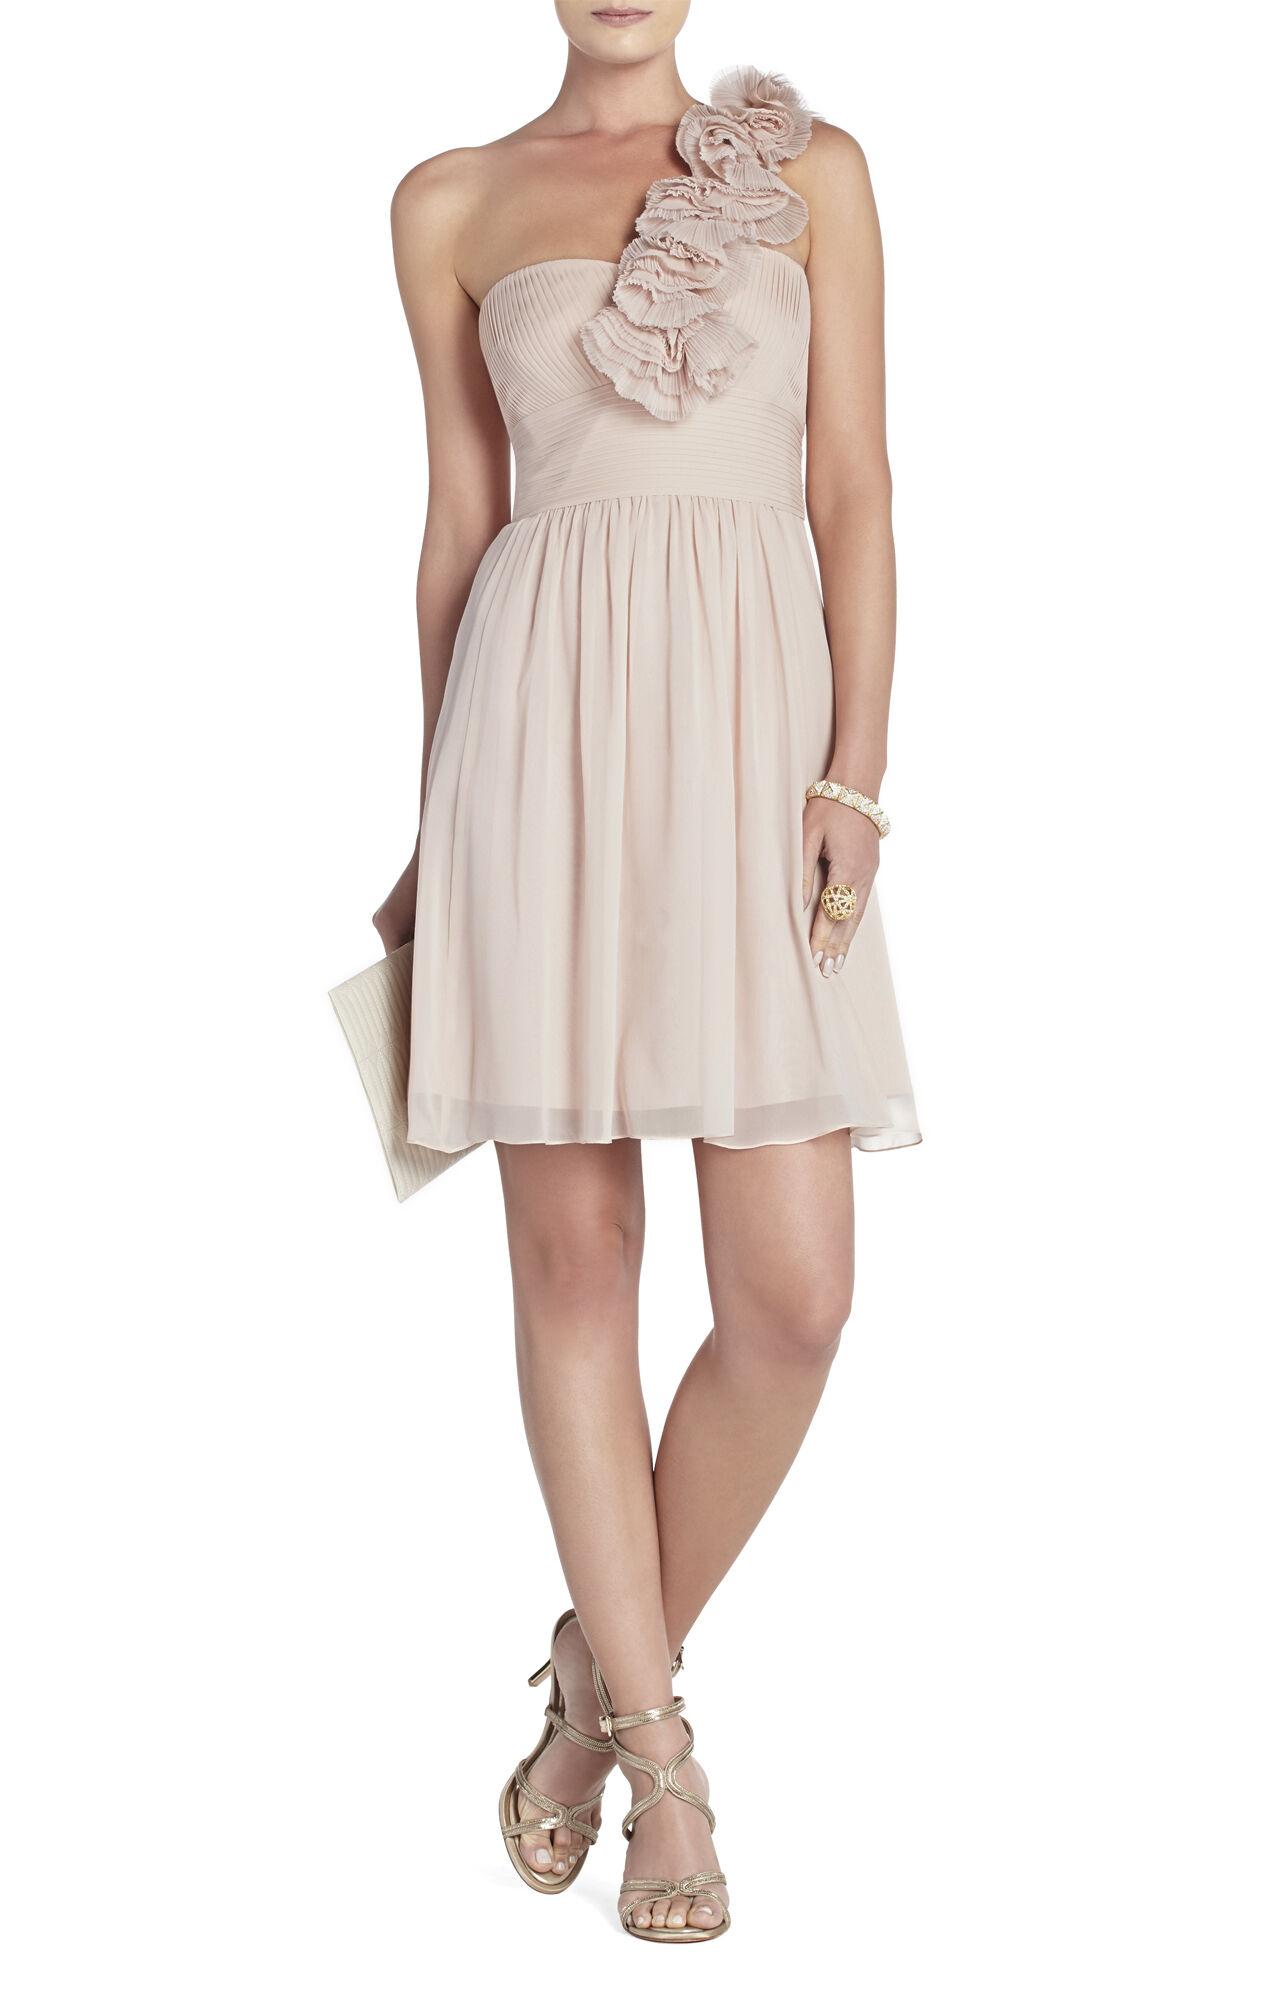 Thalia One-Shoulder Dress